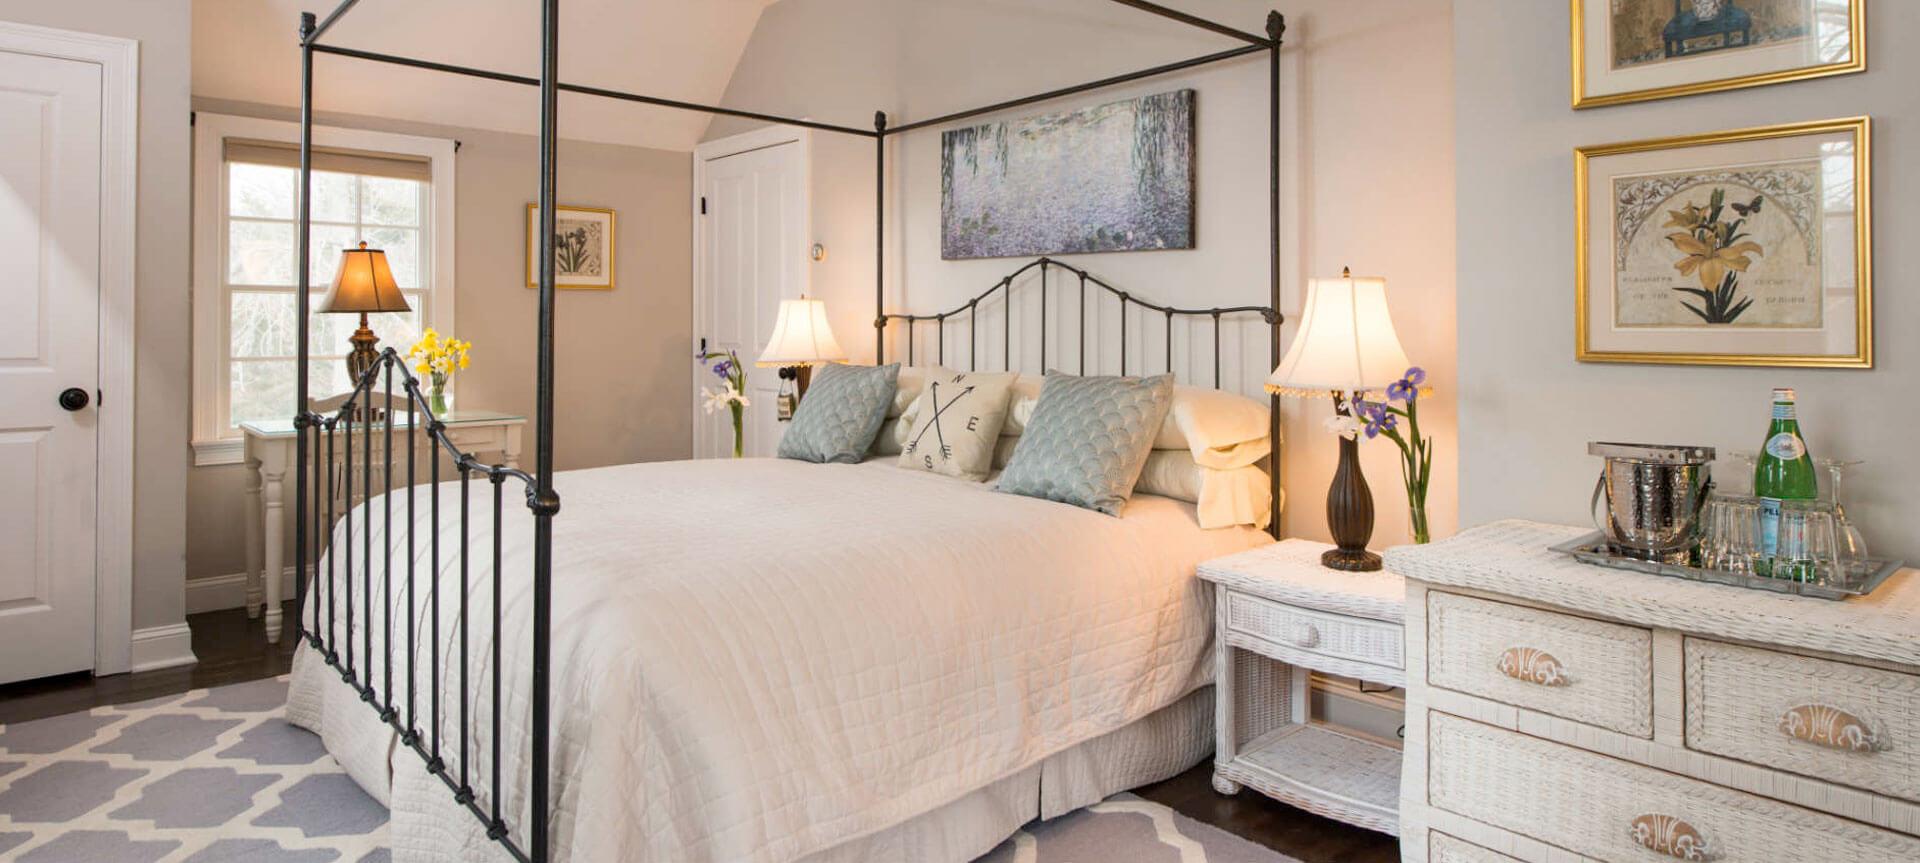 Bed Slider | Brewster By the Sea Cape Cod Inn | Brewster, MA